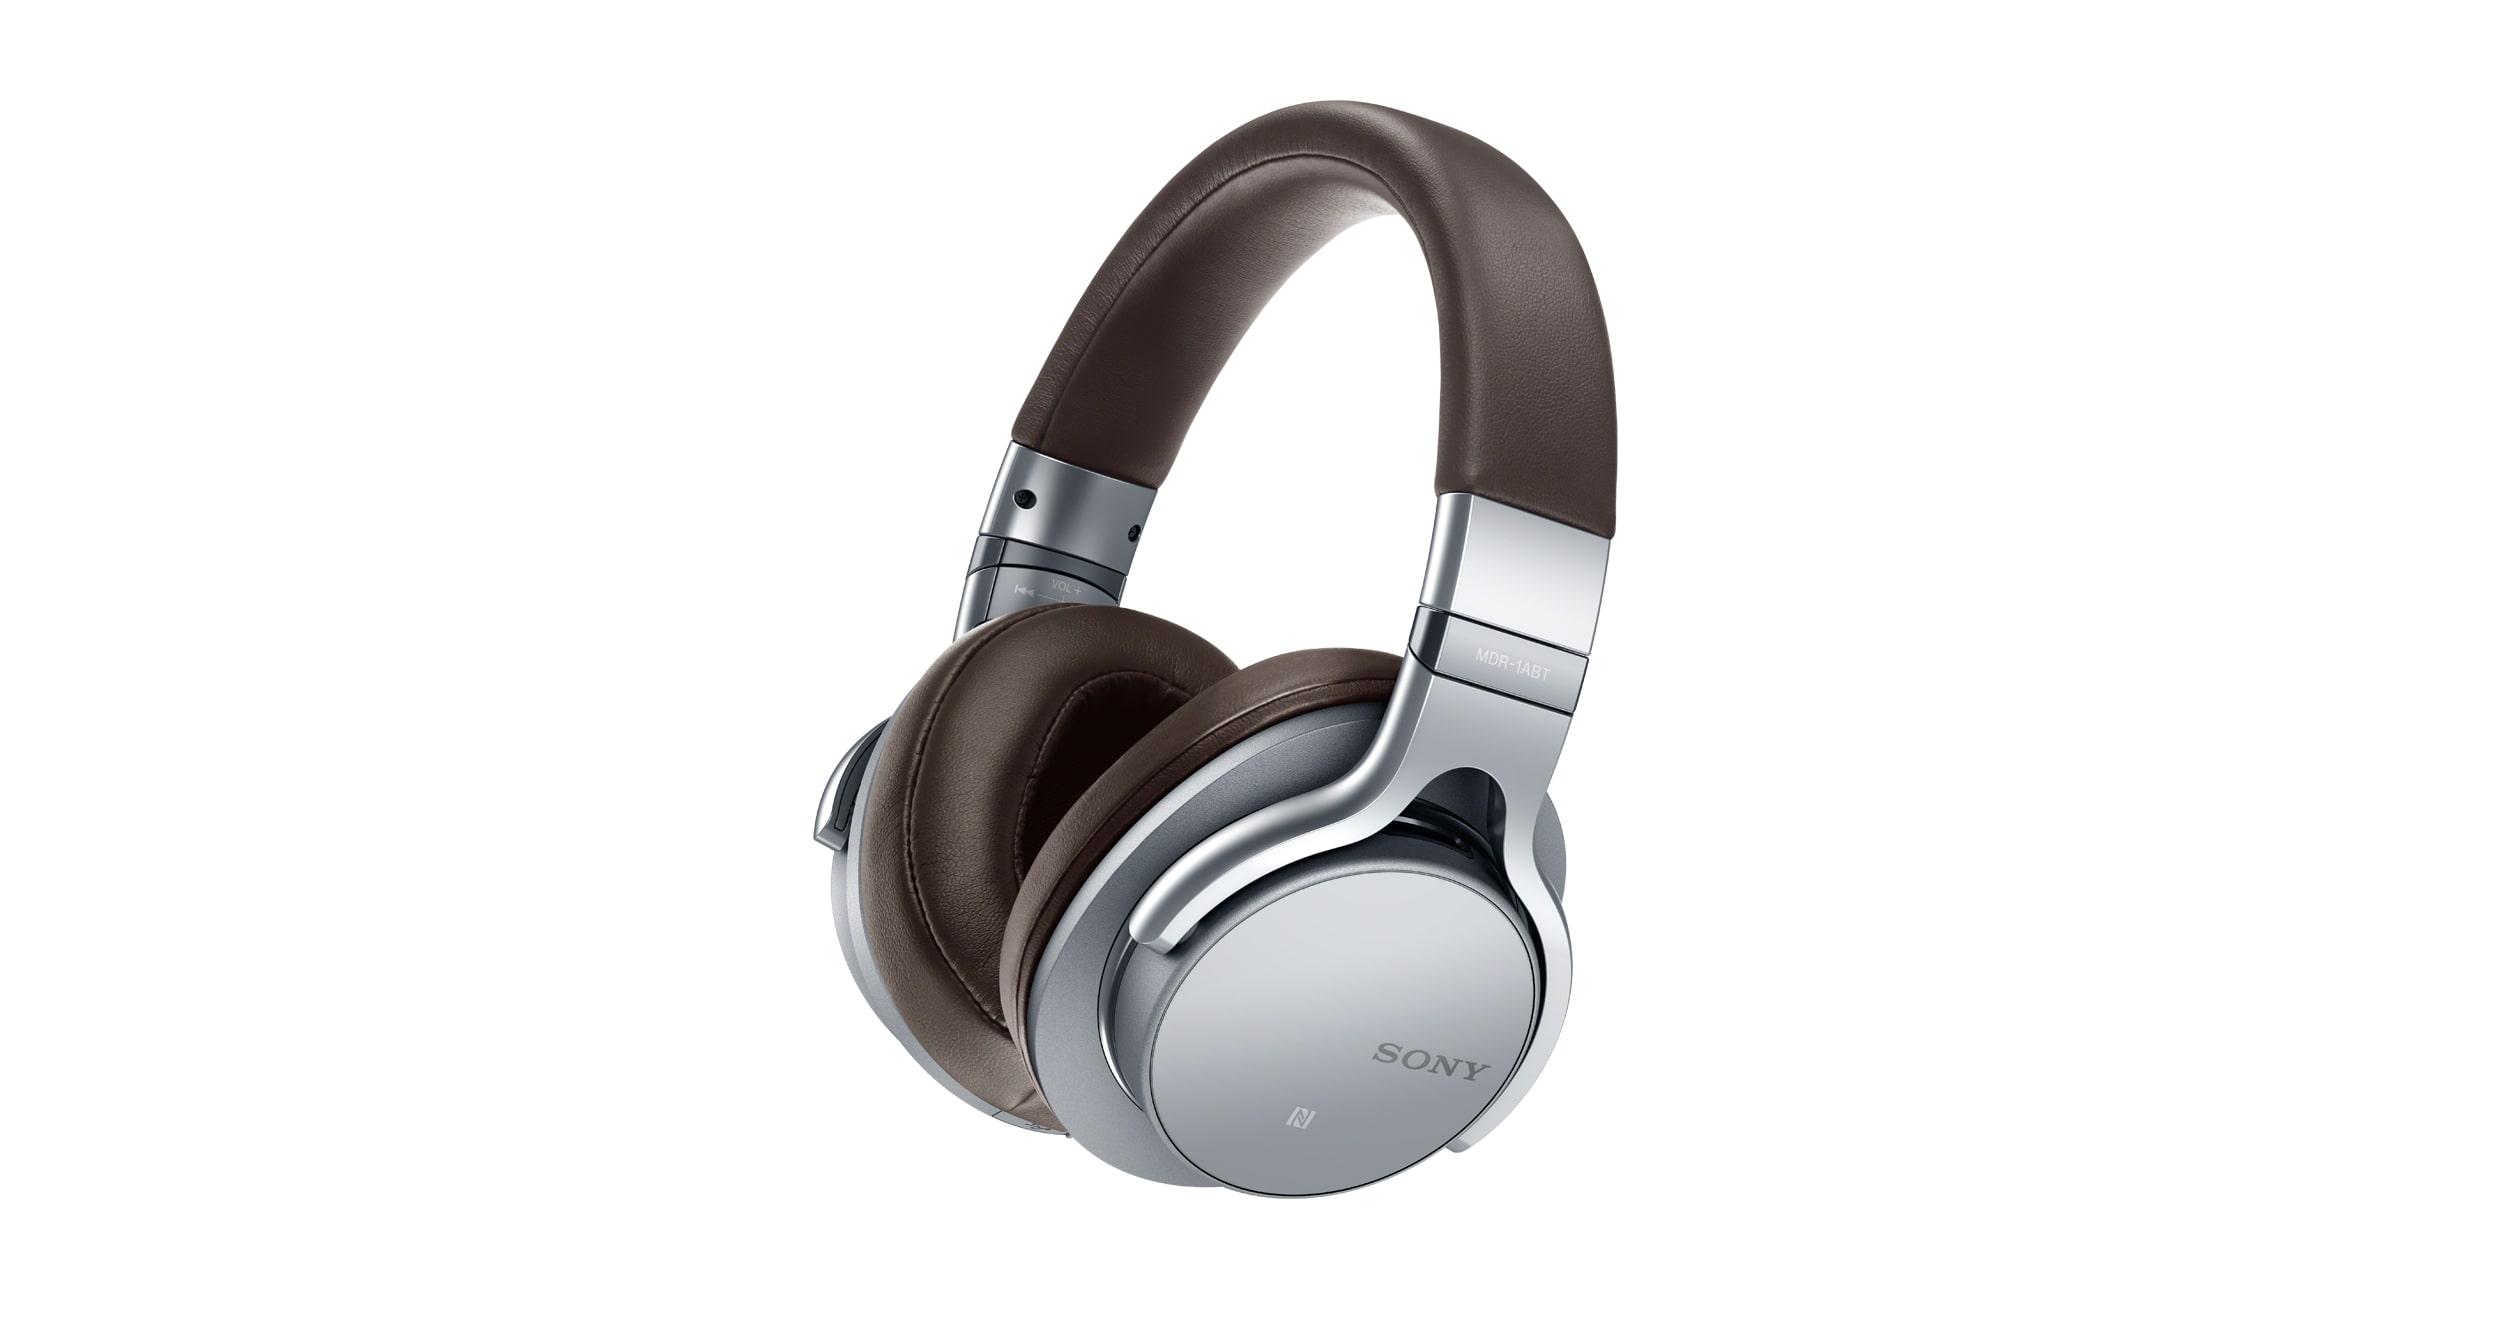 Mdr 1abt Specifications Headband Sony Us Micro Explorer Ridgid 30063